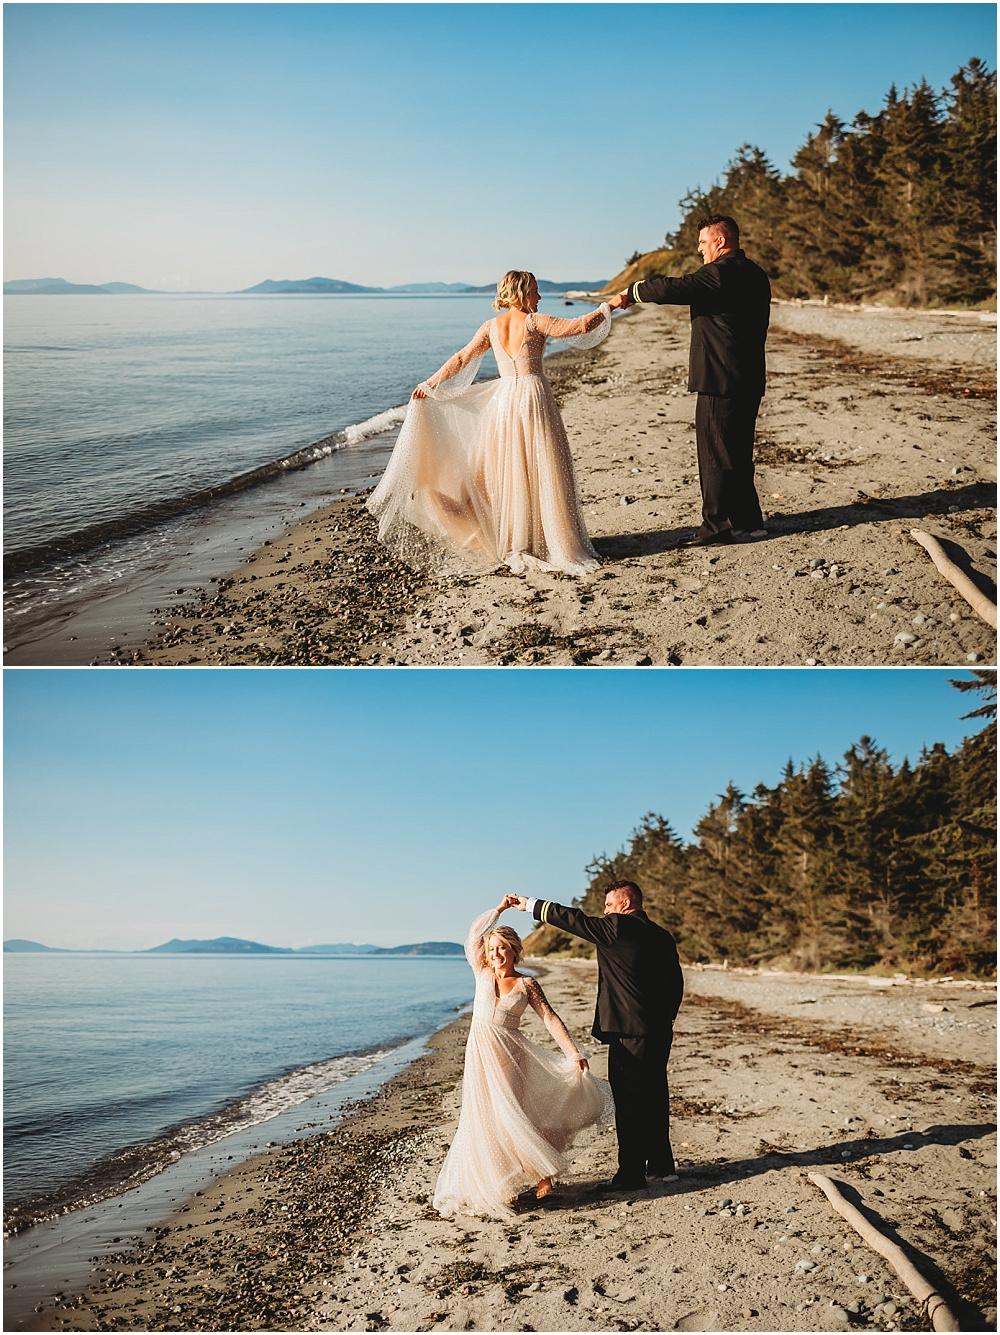 Bride and groom dance on the beach